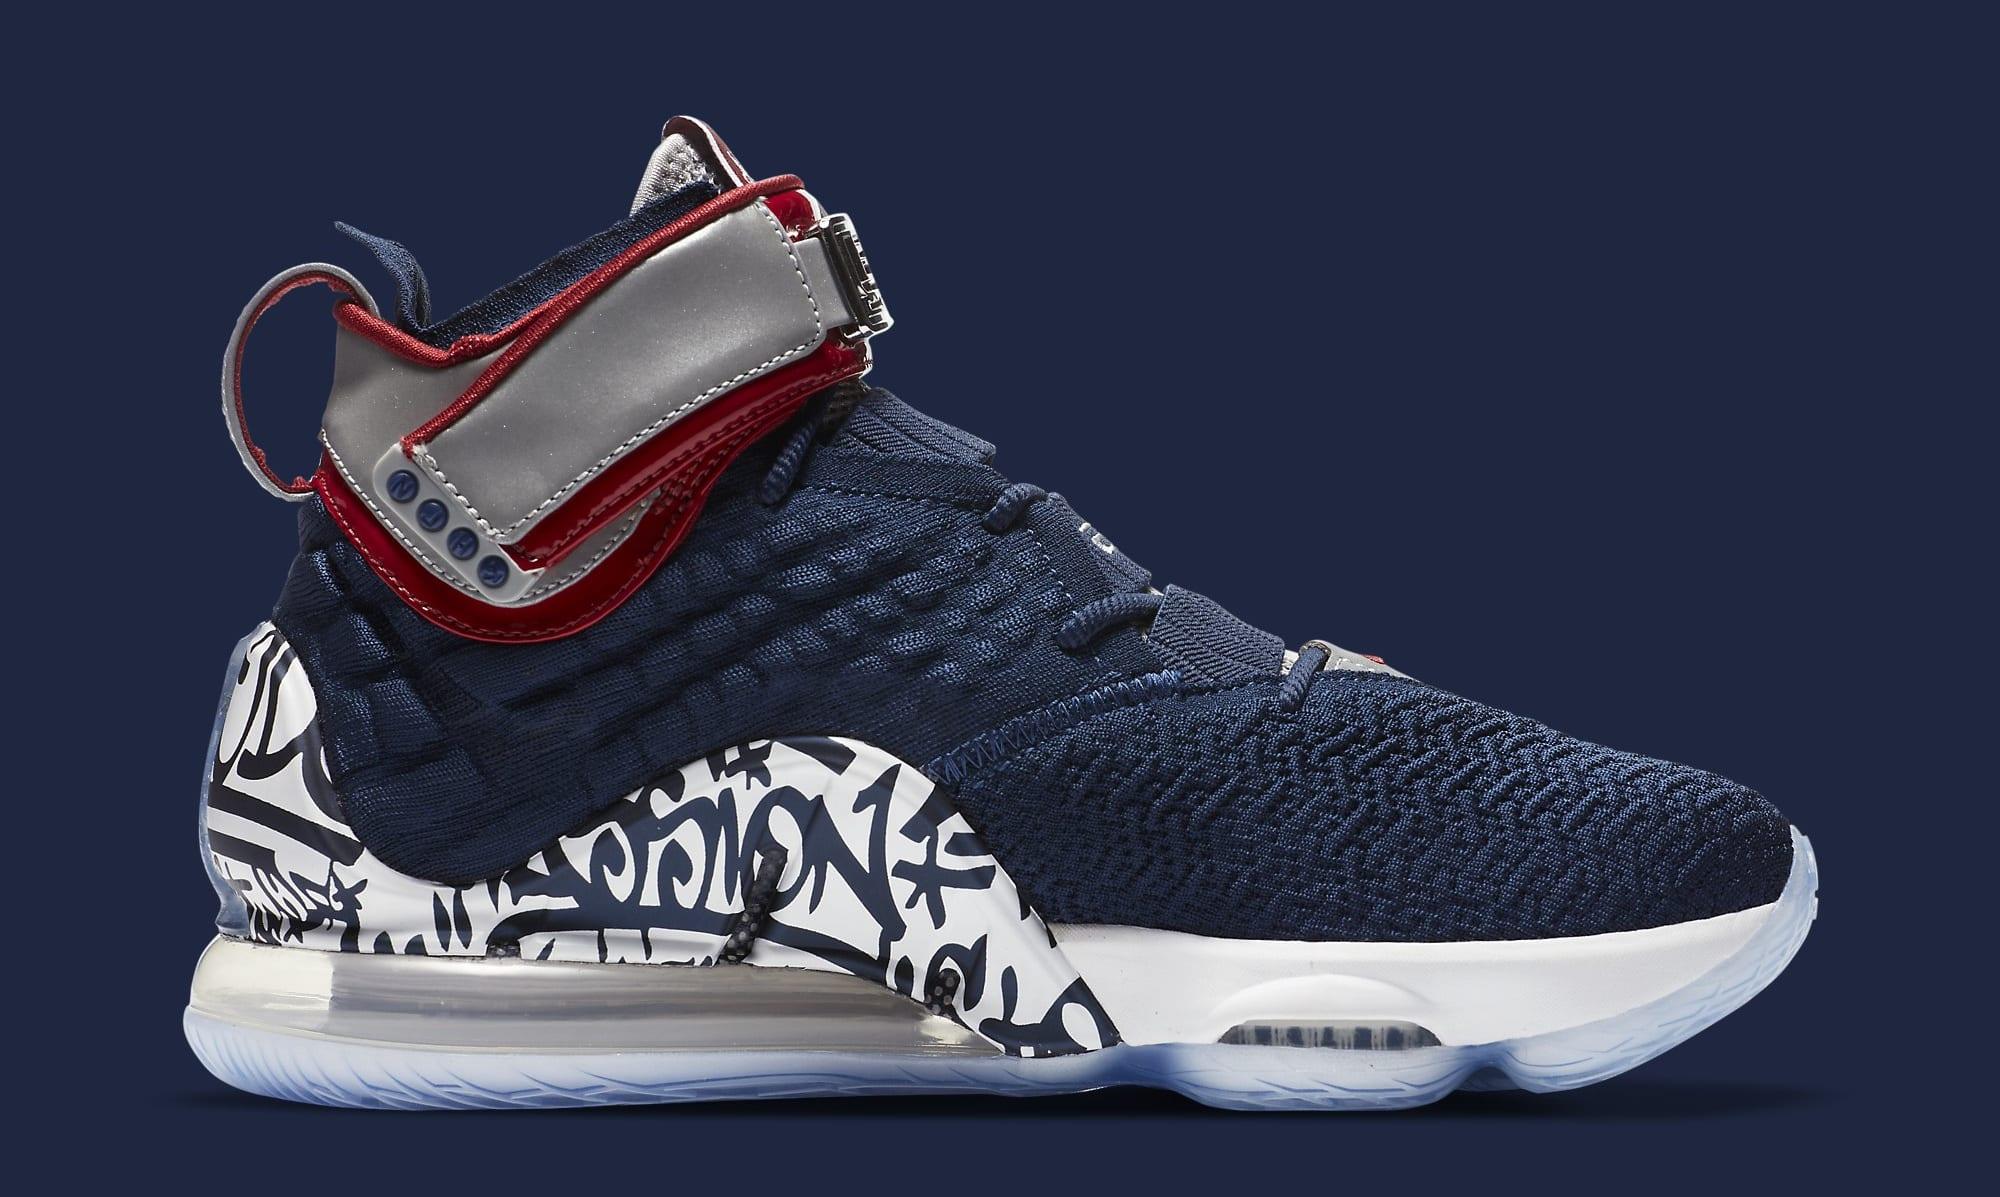 Nike LeBron 17 'All-Star Graffiti' CT6047-400 Medial